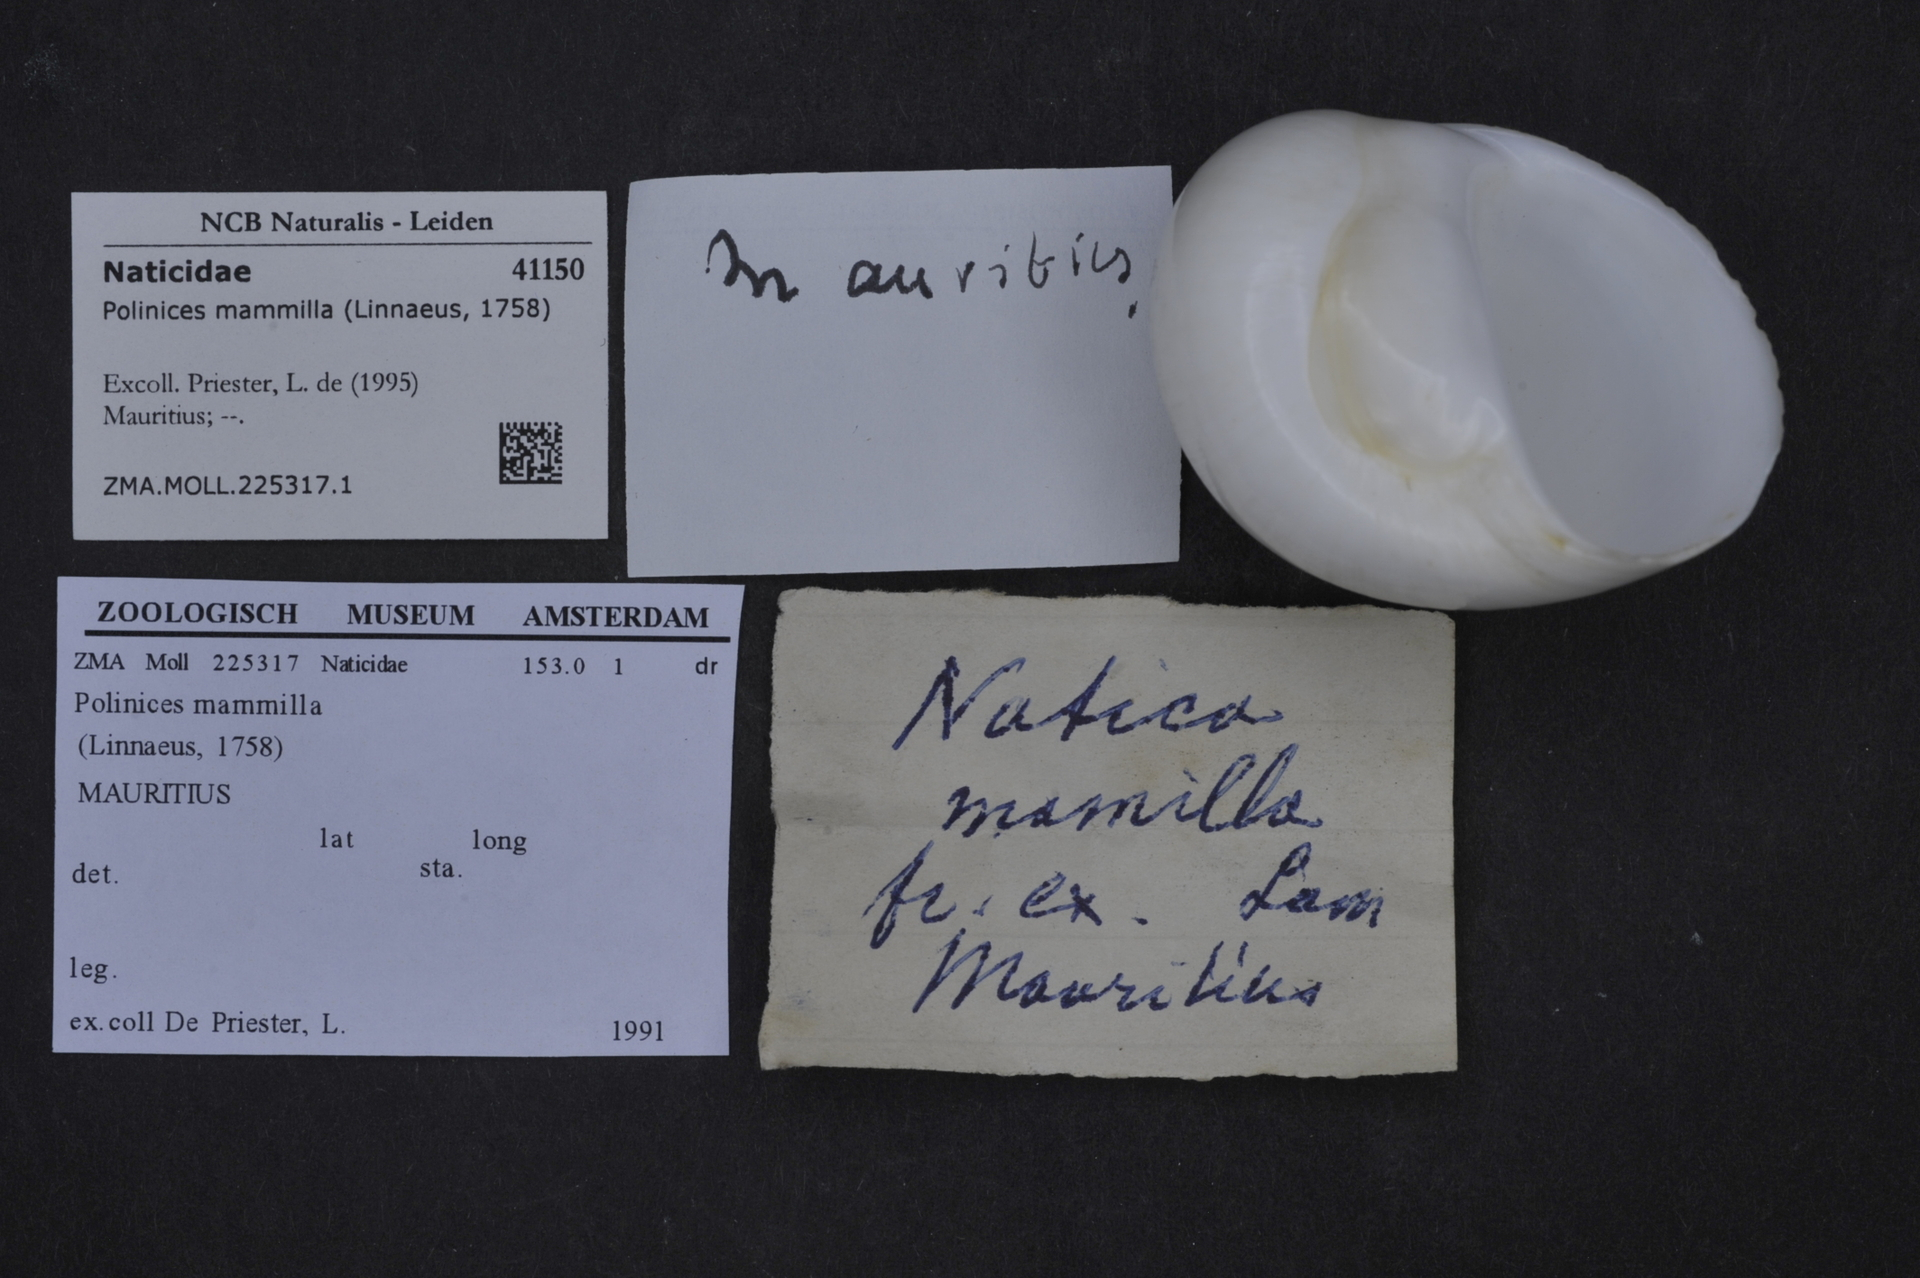 ZMA.MOLL.225317.1 | Polinices mammilla (Linnaeus, 1758)